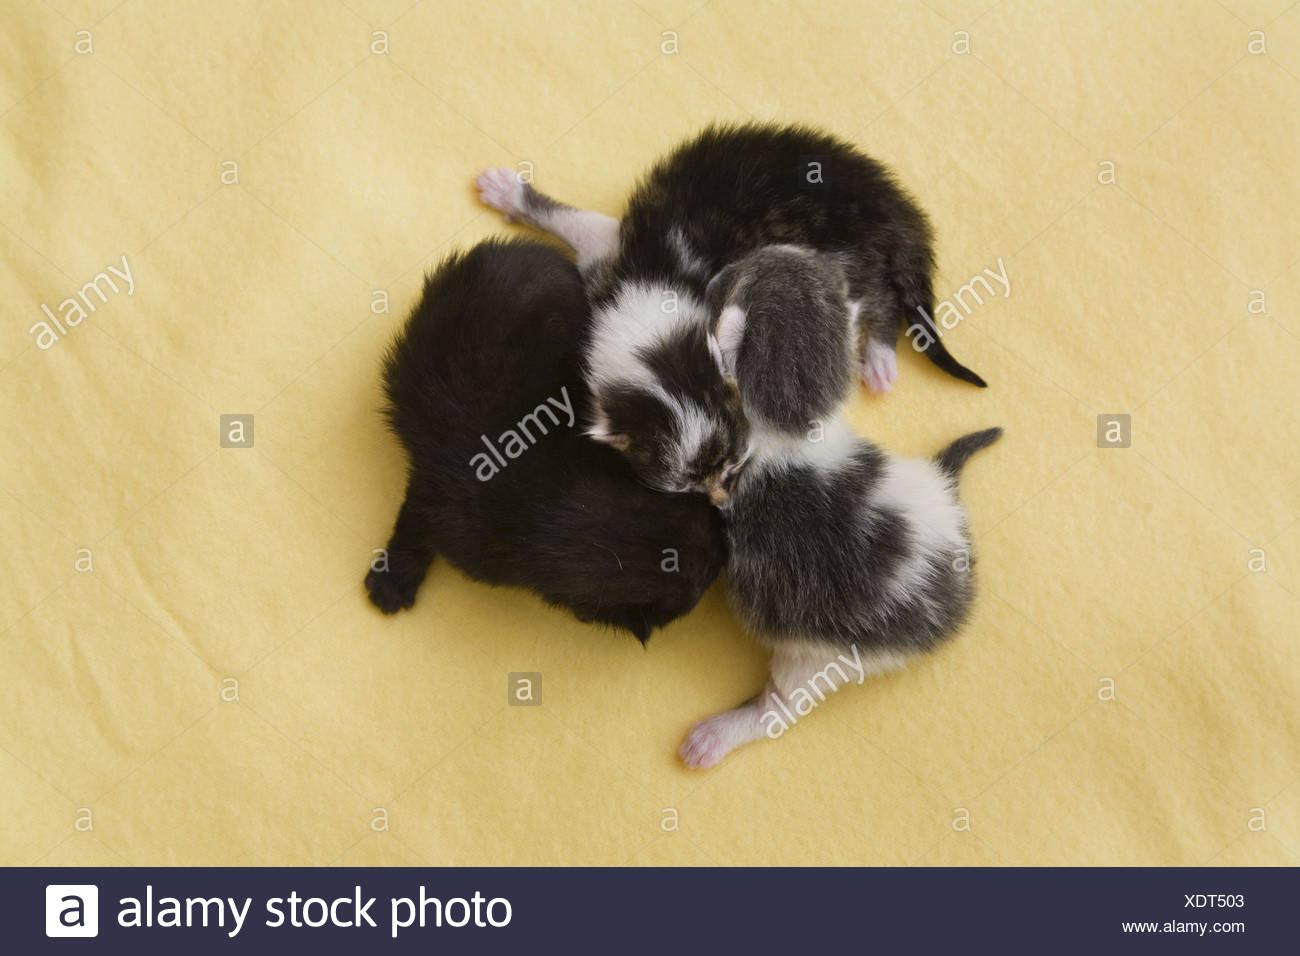 domestic cat, house cat (Felis silvestris f. catus), three newborn domestic cats cuddling - Stock Image